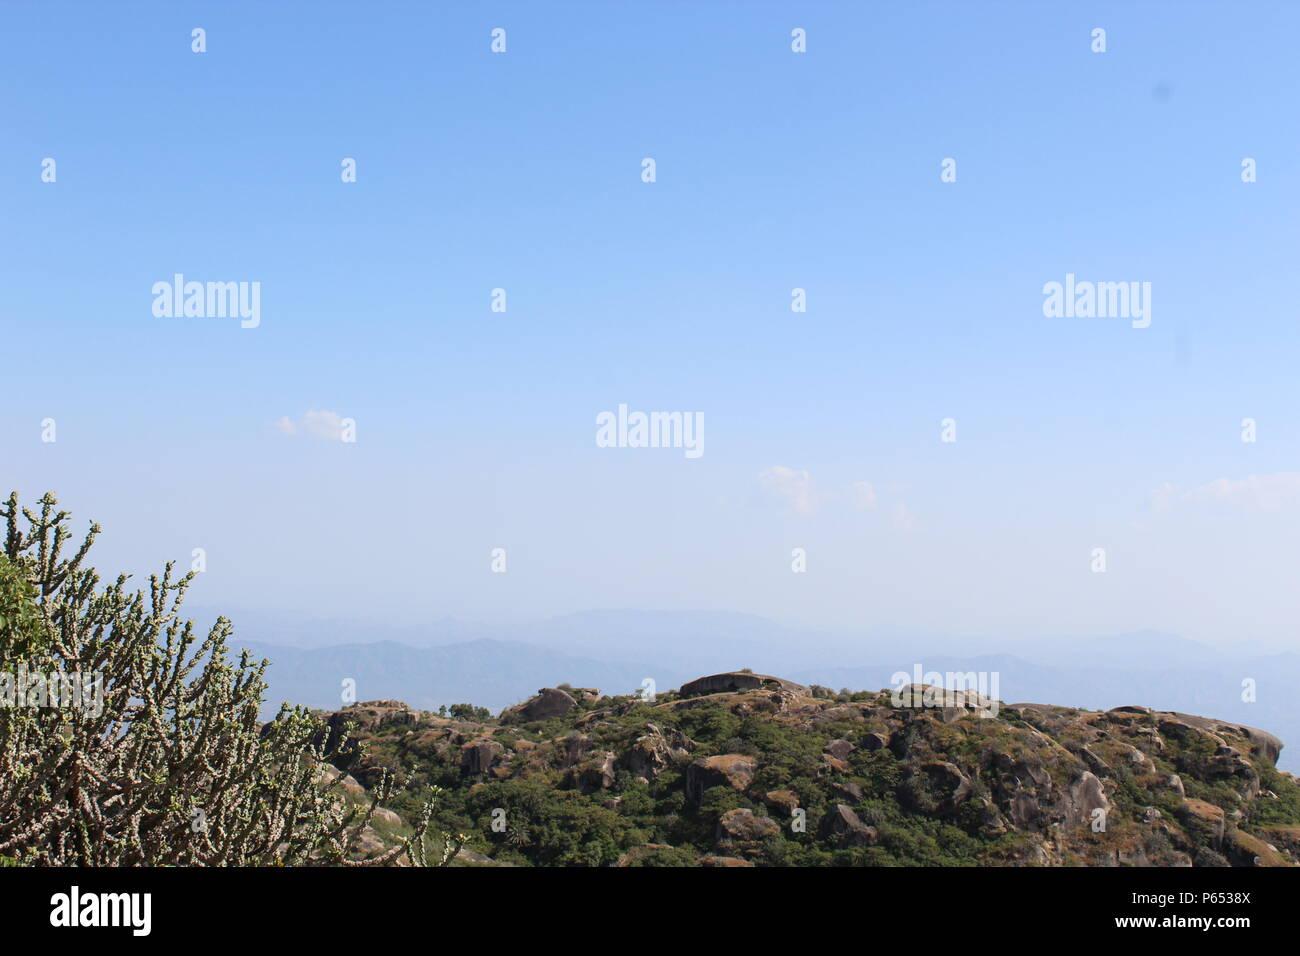 Beauty of Guru shikhar in Mount Abu Rajasthan - Stock Image